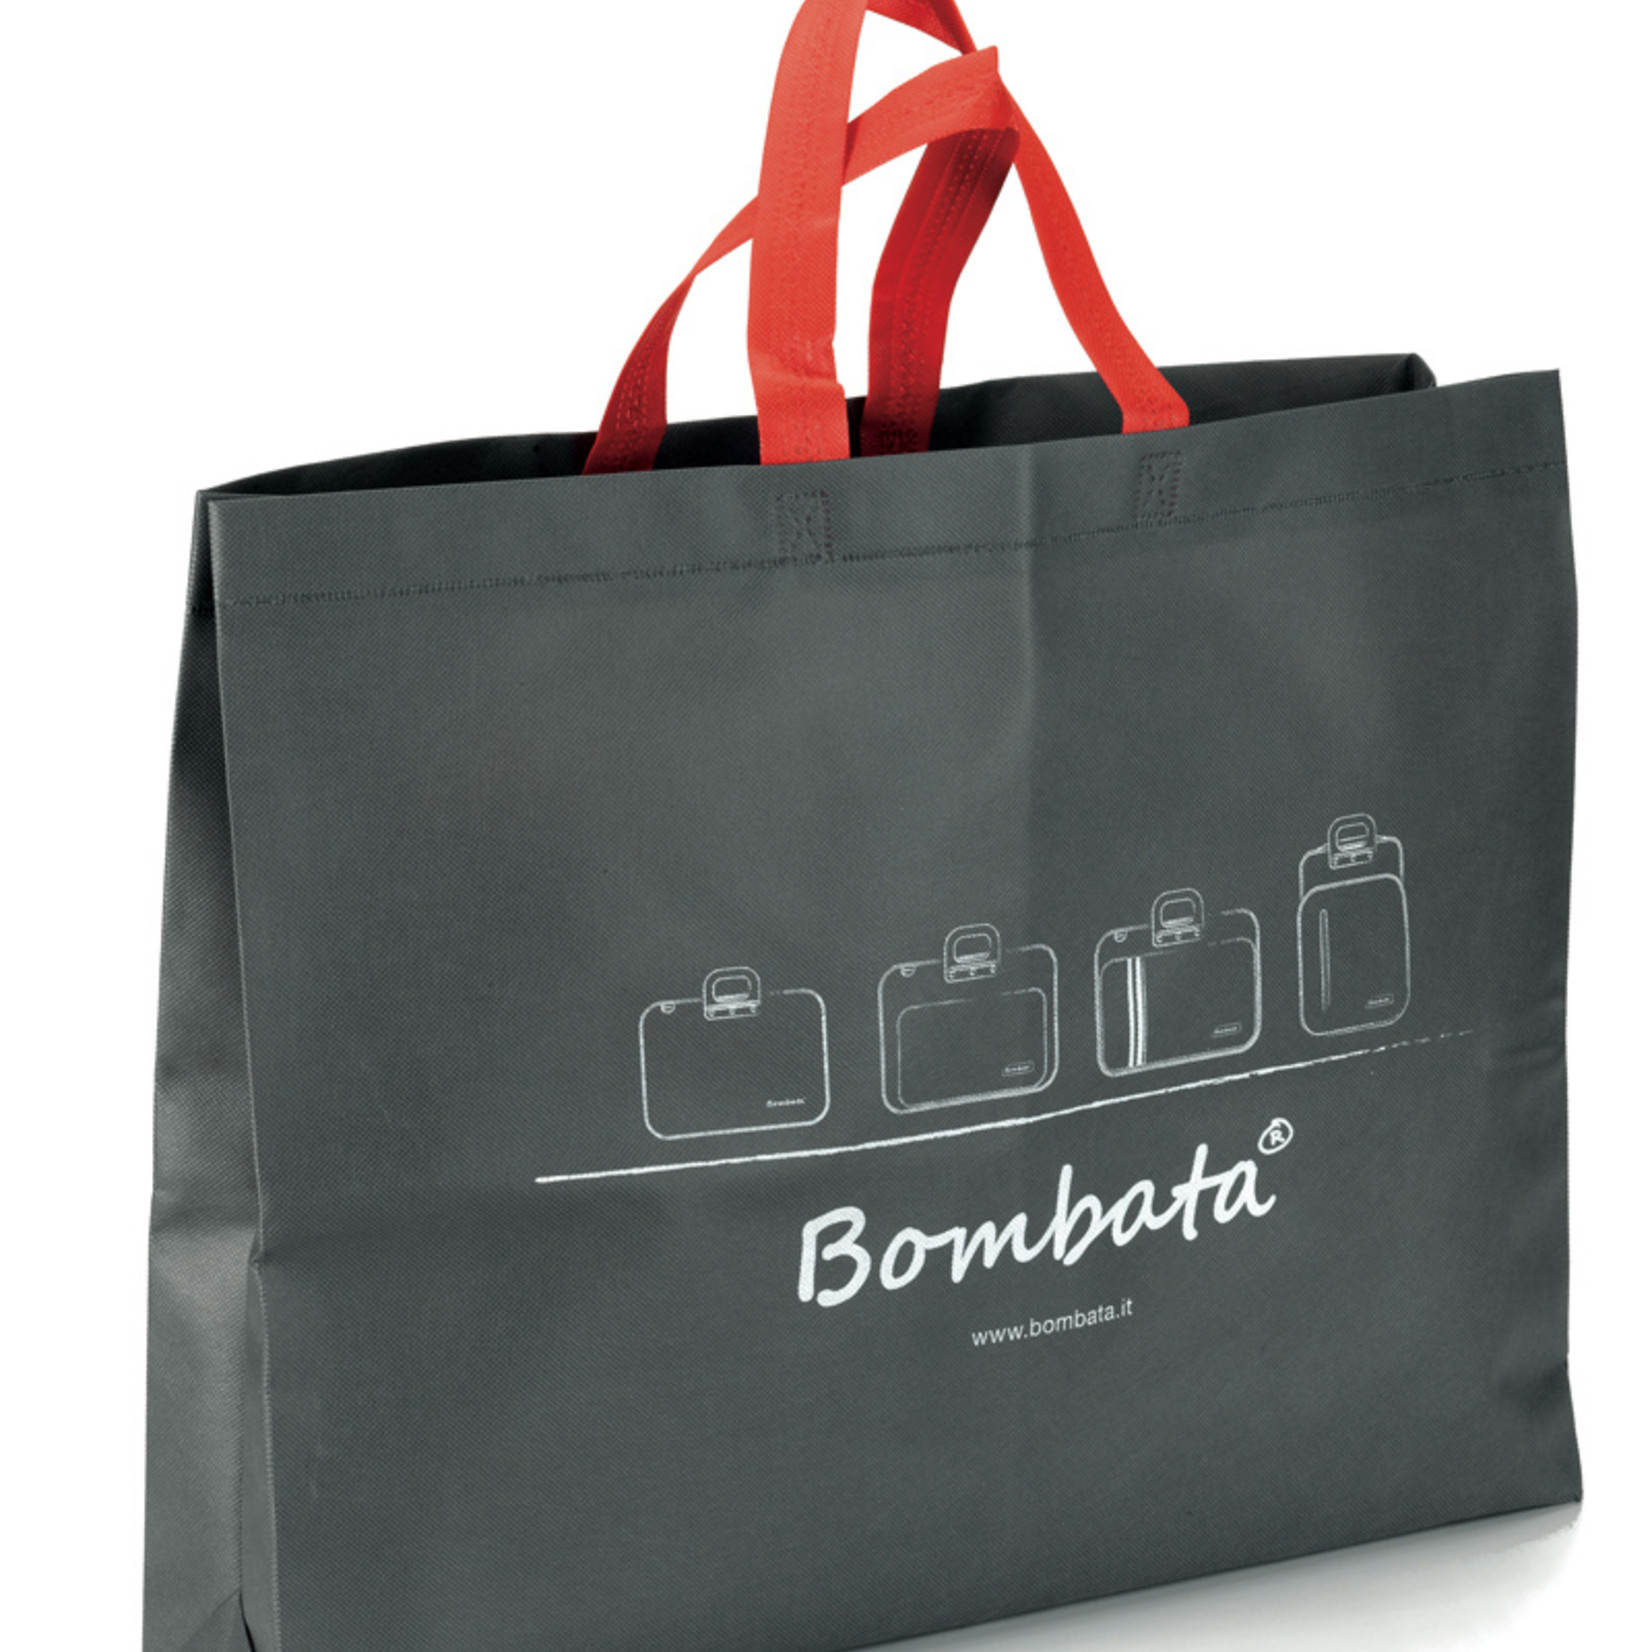 "Bombata Taschen Laptoptasche 13"" | Mediobombata Classic | dunkelblau"